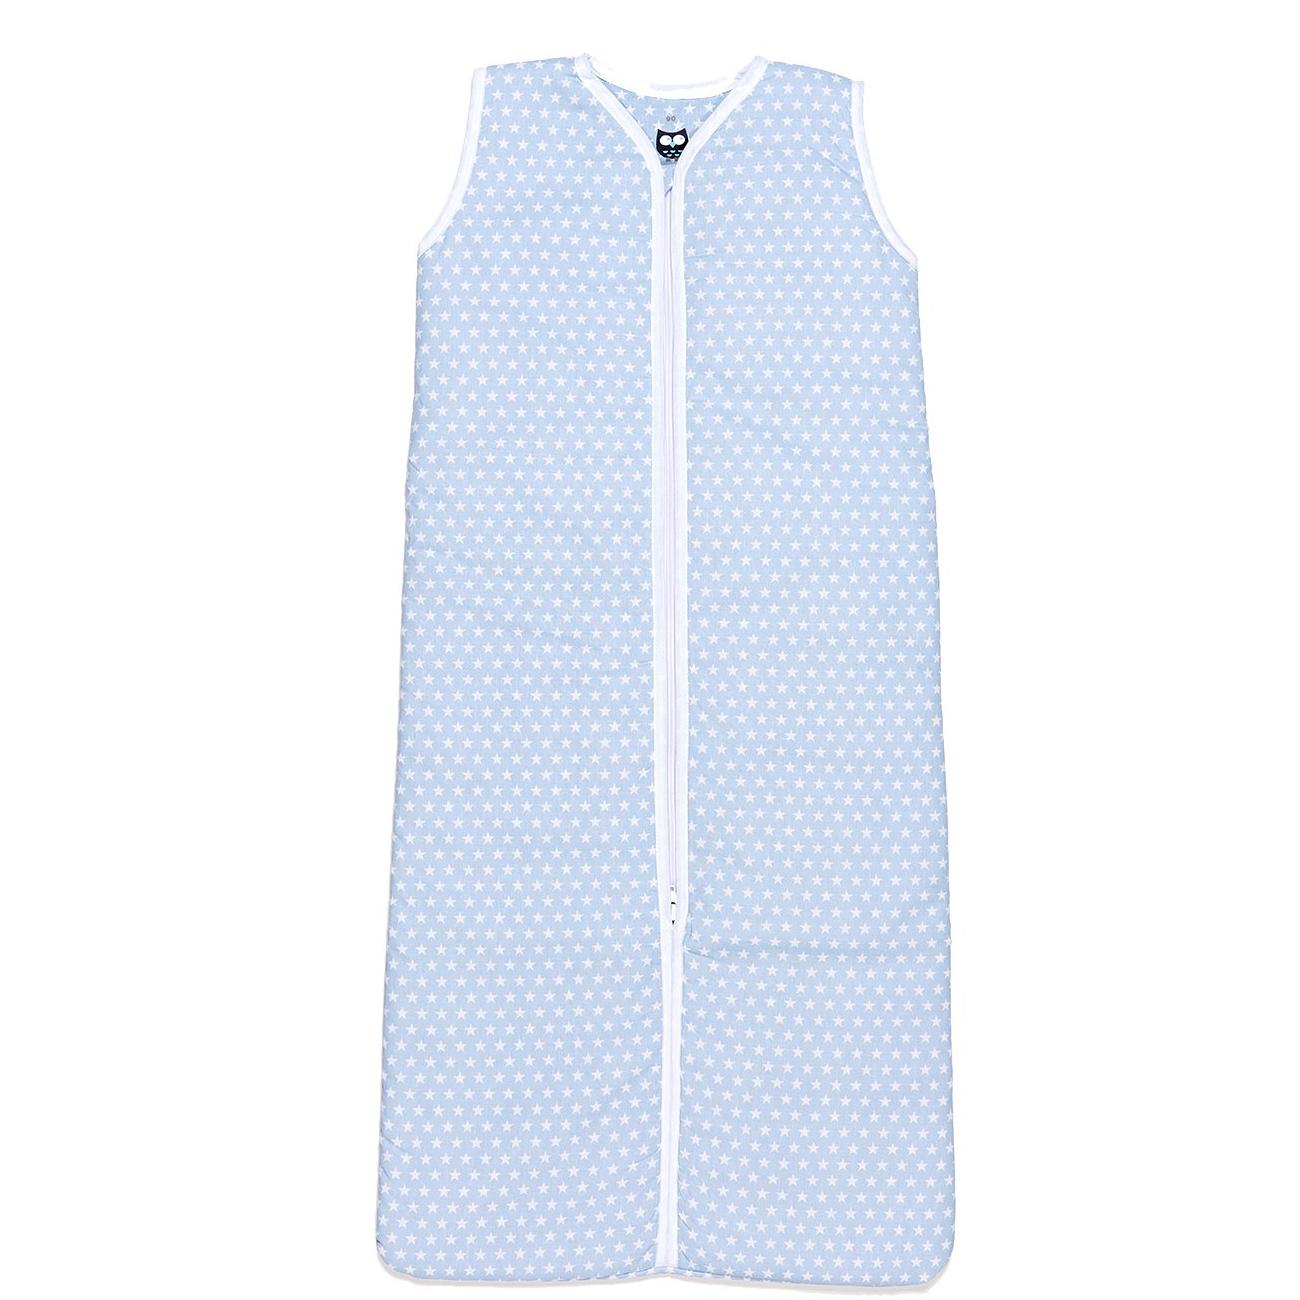 Sommerschlafsack Hellblau 70cm - Briljant Baby